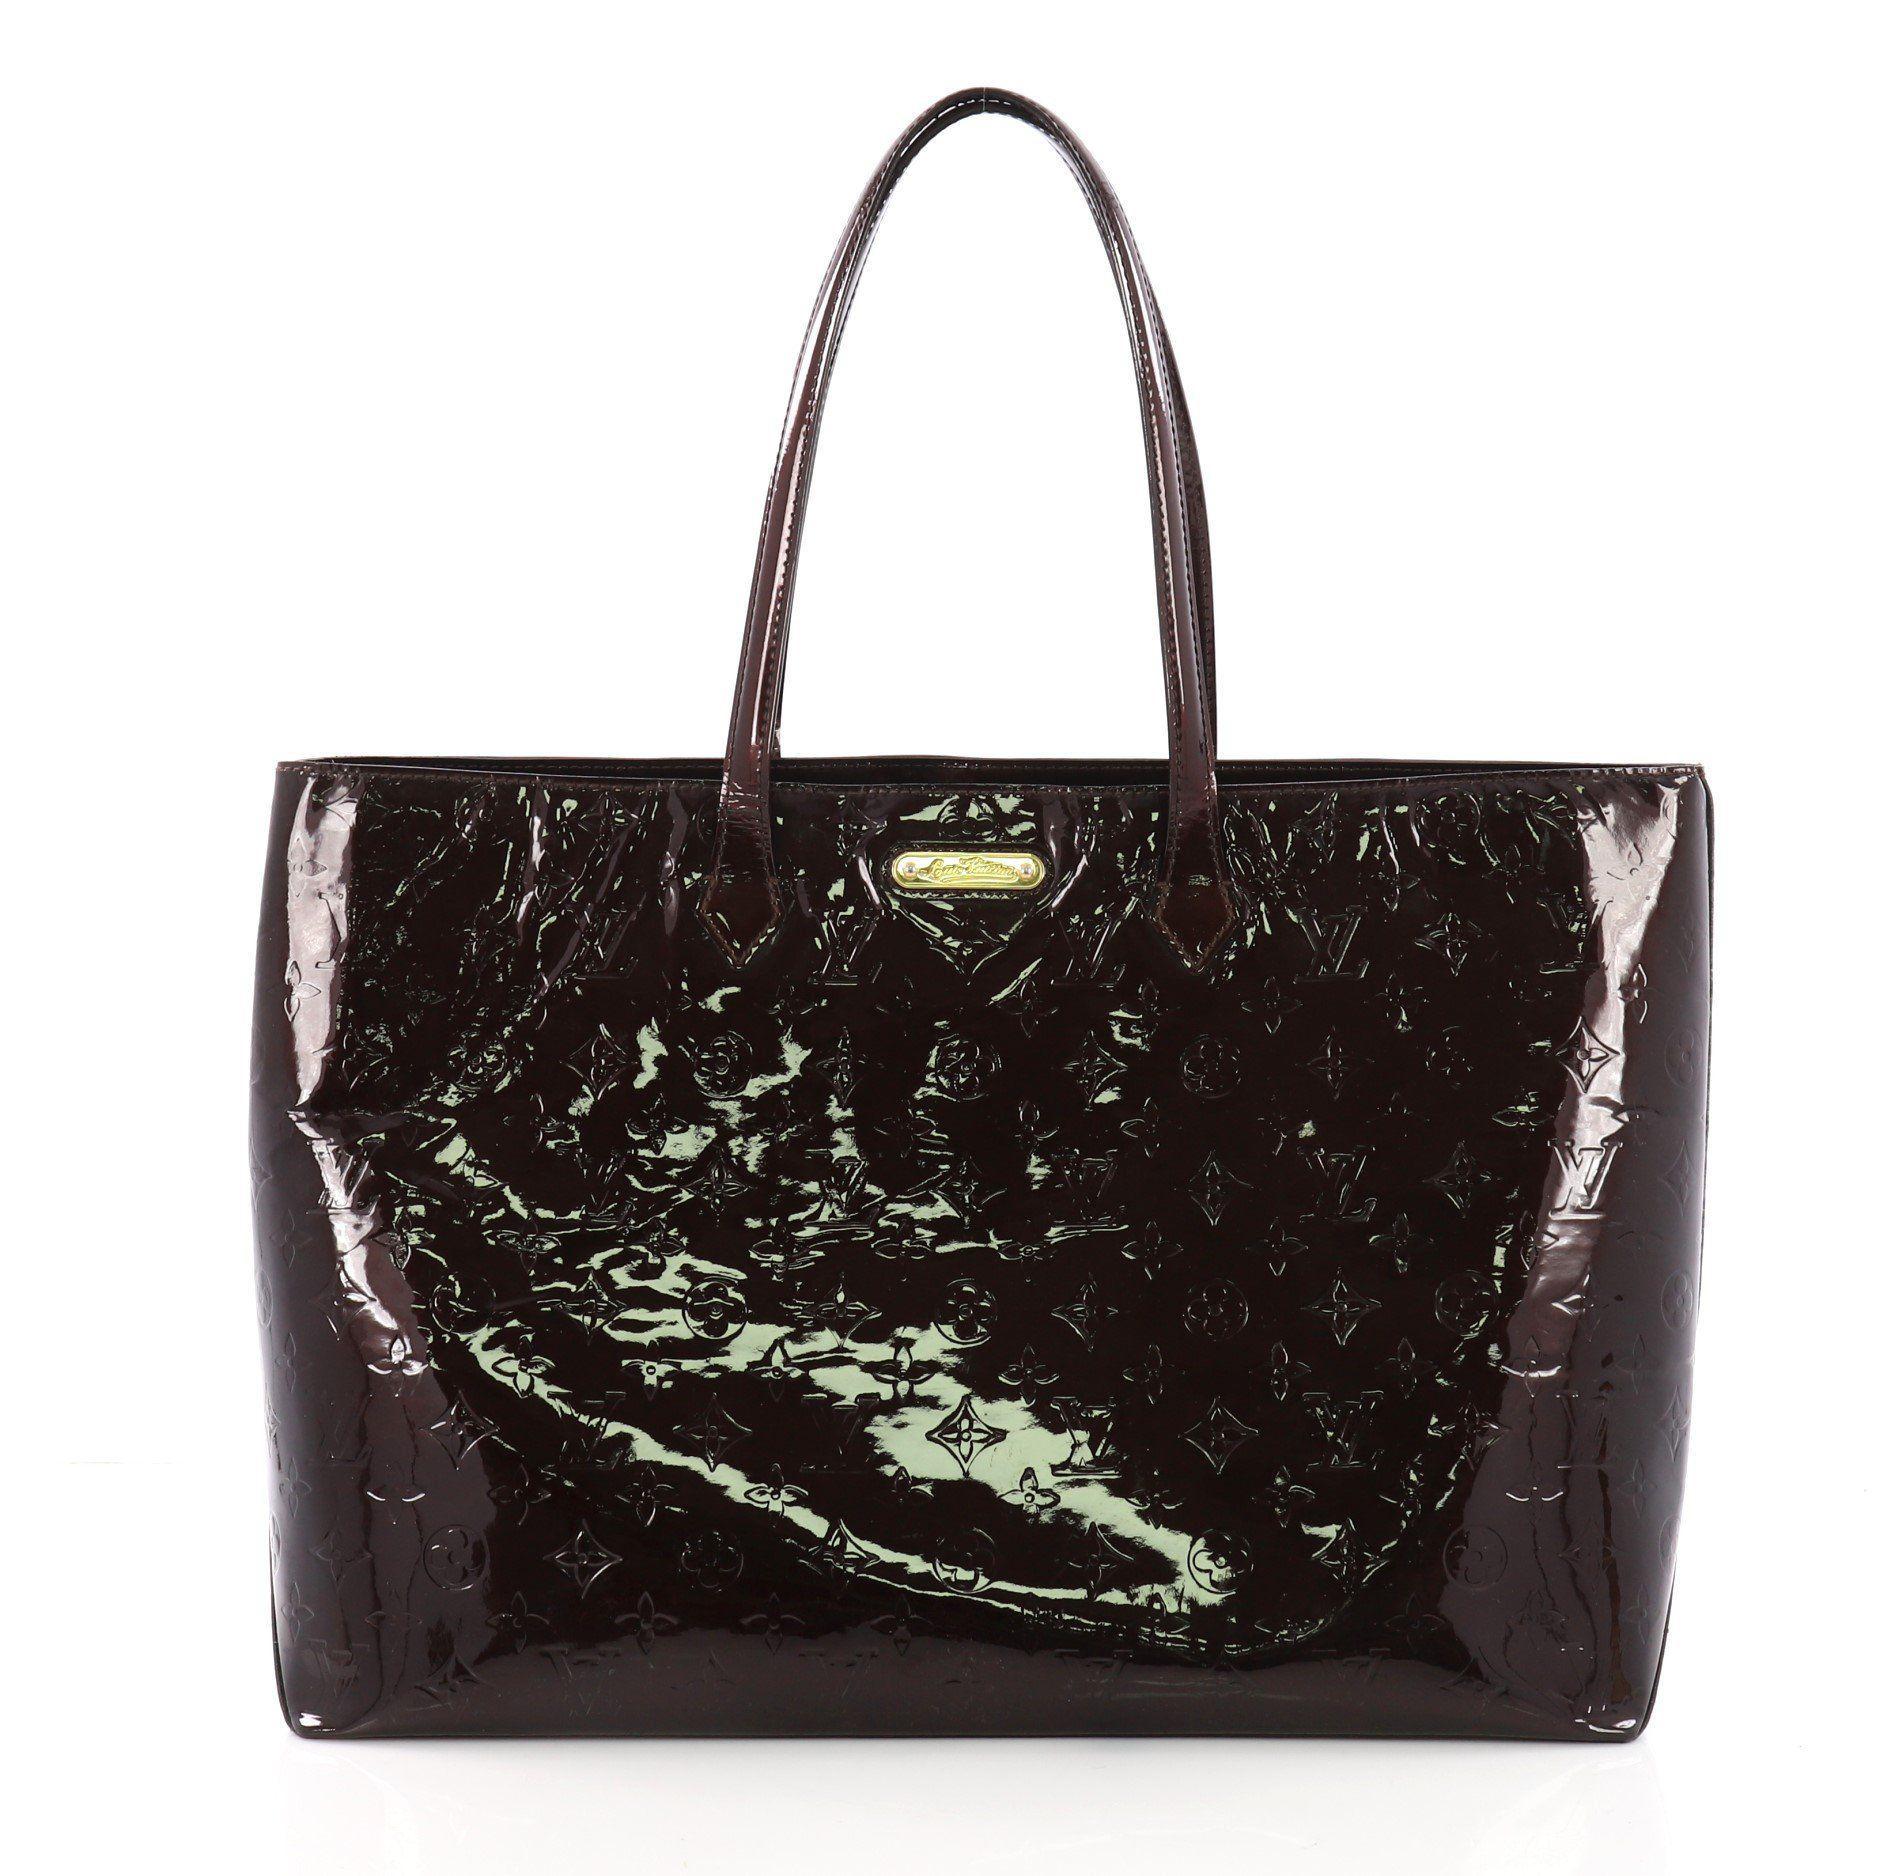 5b9229ea99db Louis Vuitton Monogram Vernis Patent Leather Handbag - Best Handbag 2018